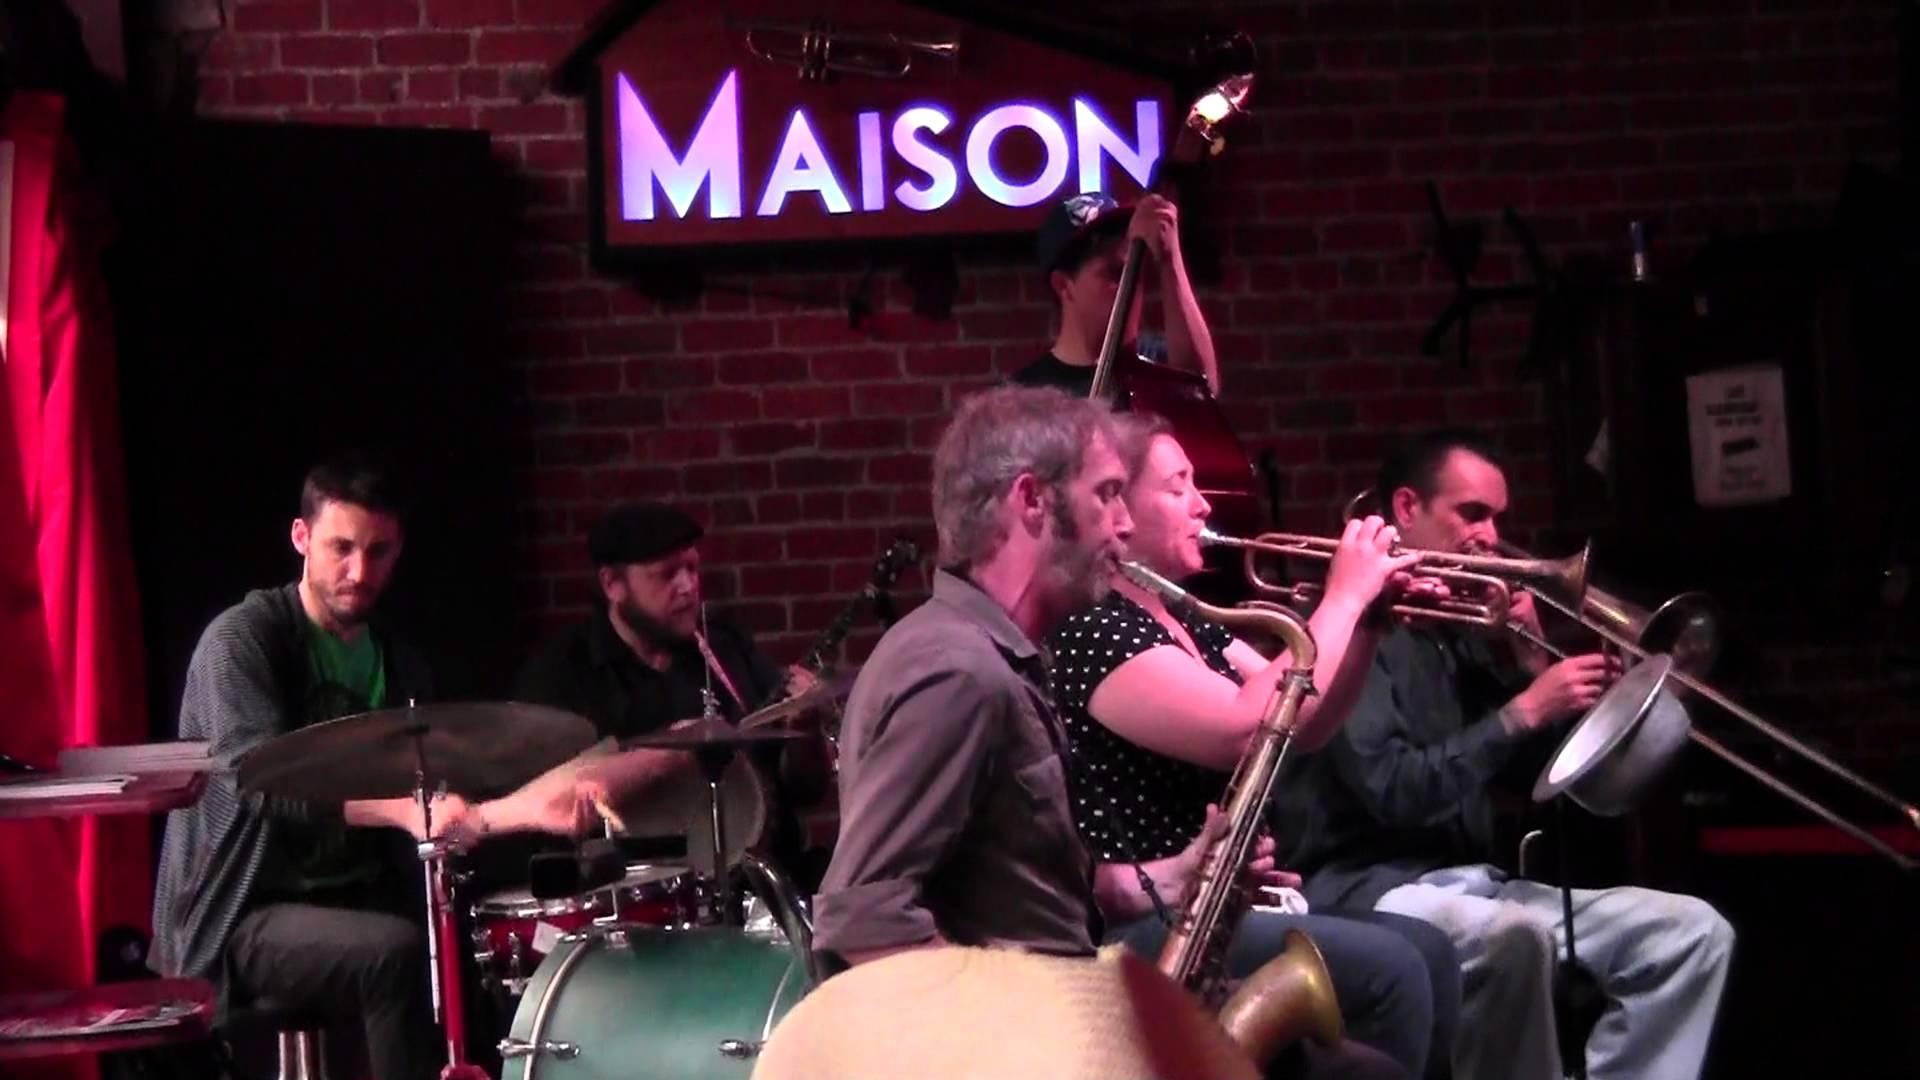 The Shotgun Jazz Band Fridays at The Maison